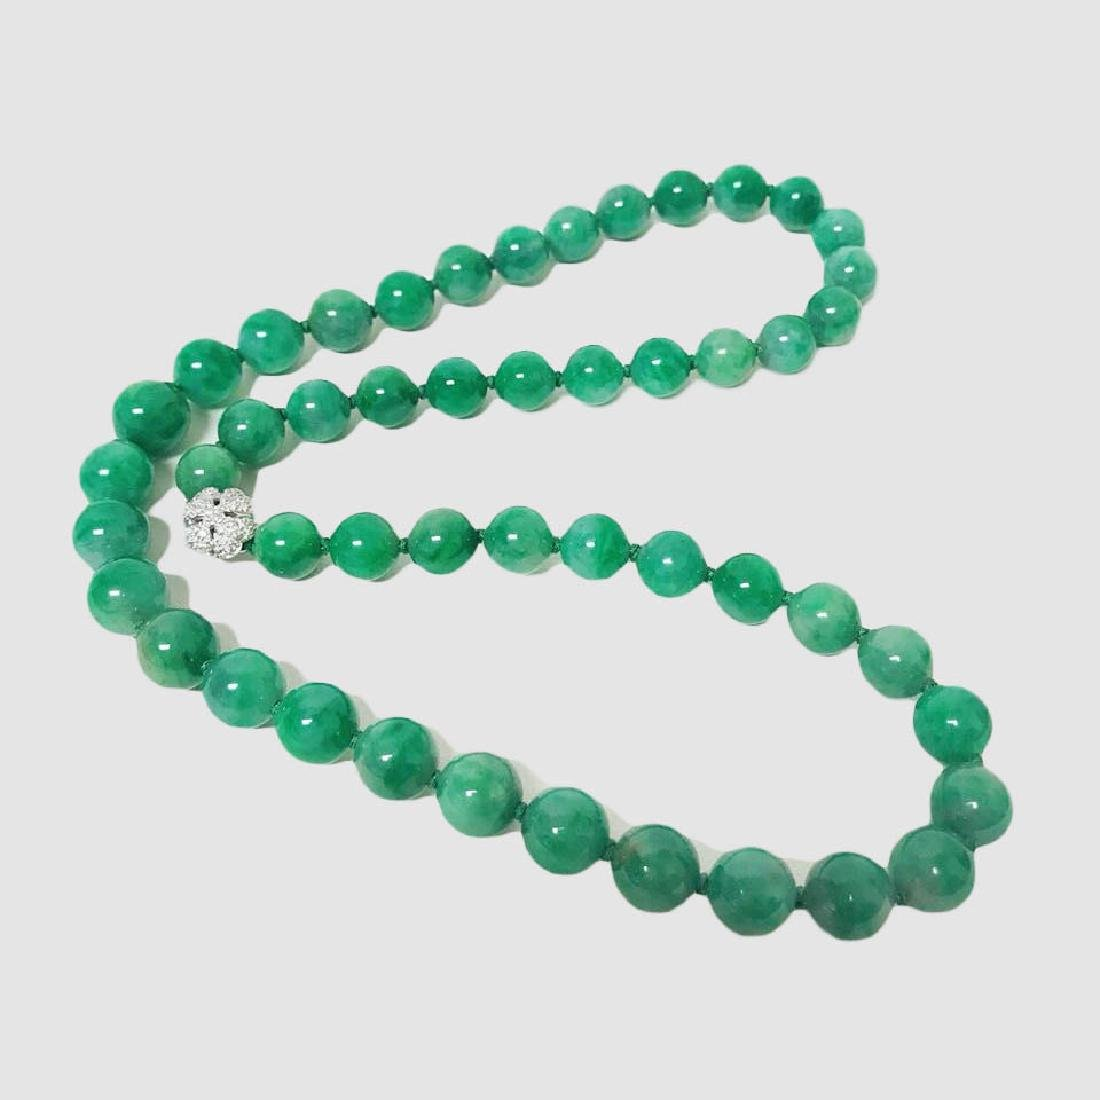 Certified Natural Burma colourless jadeite necklace